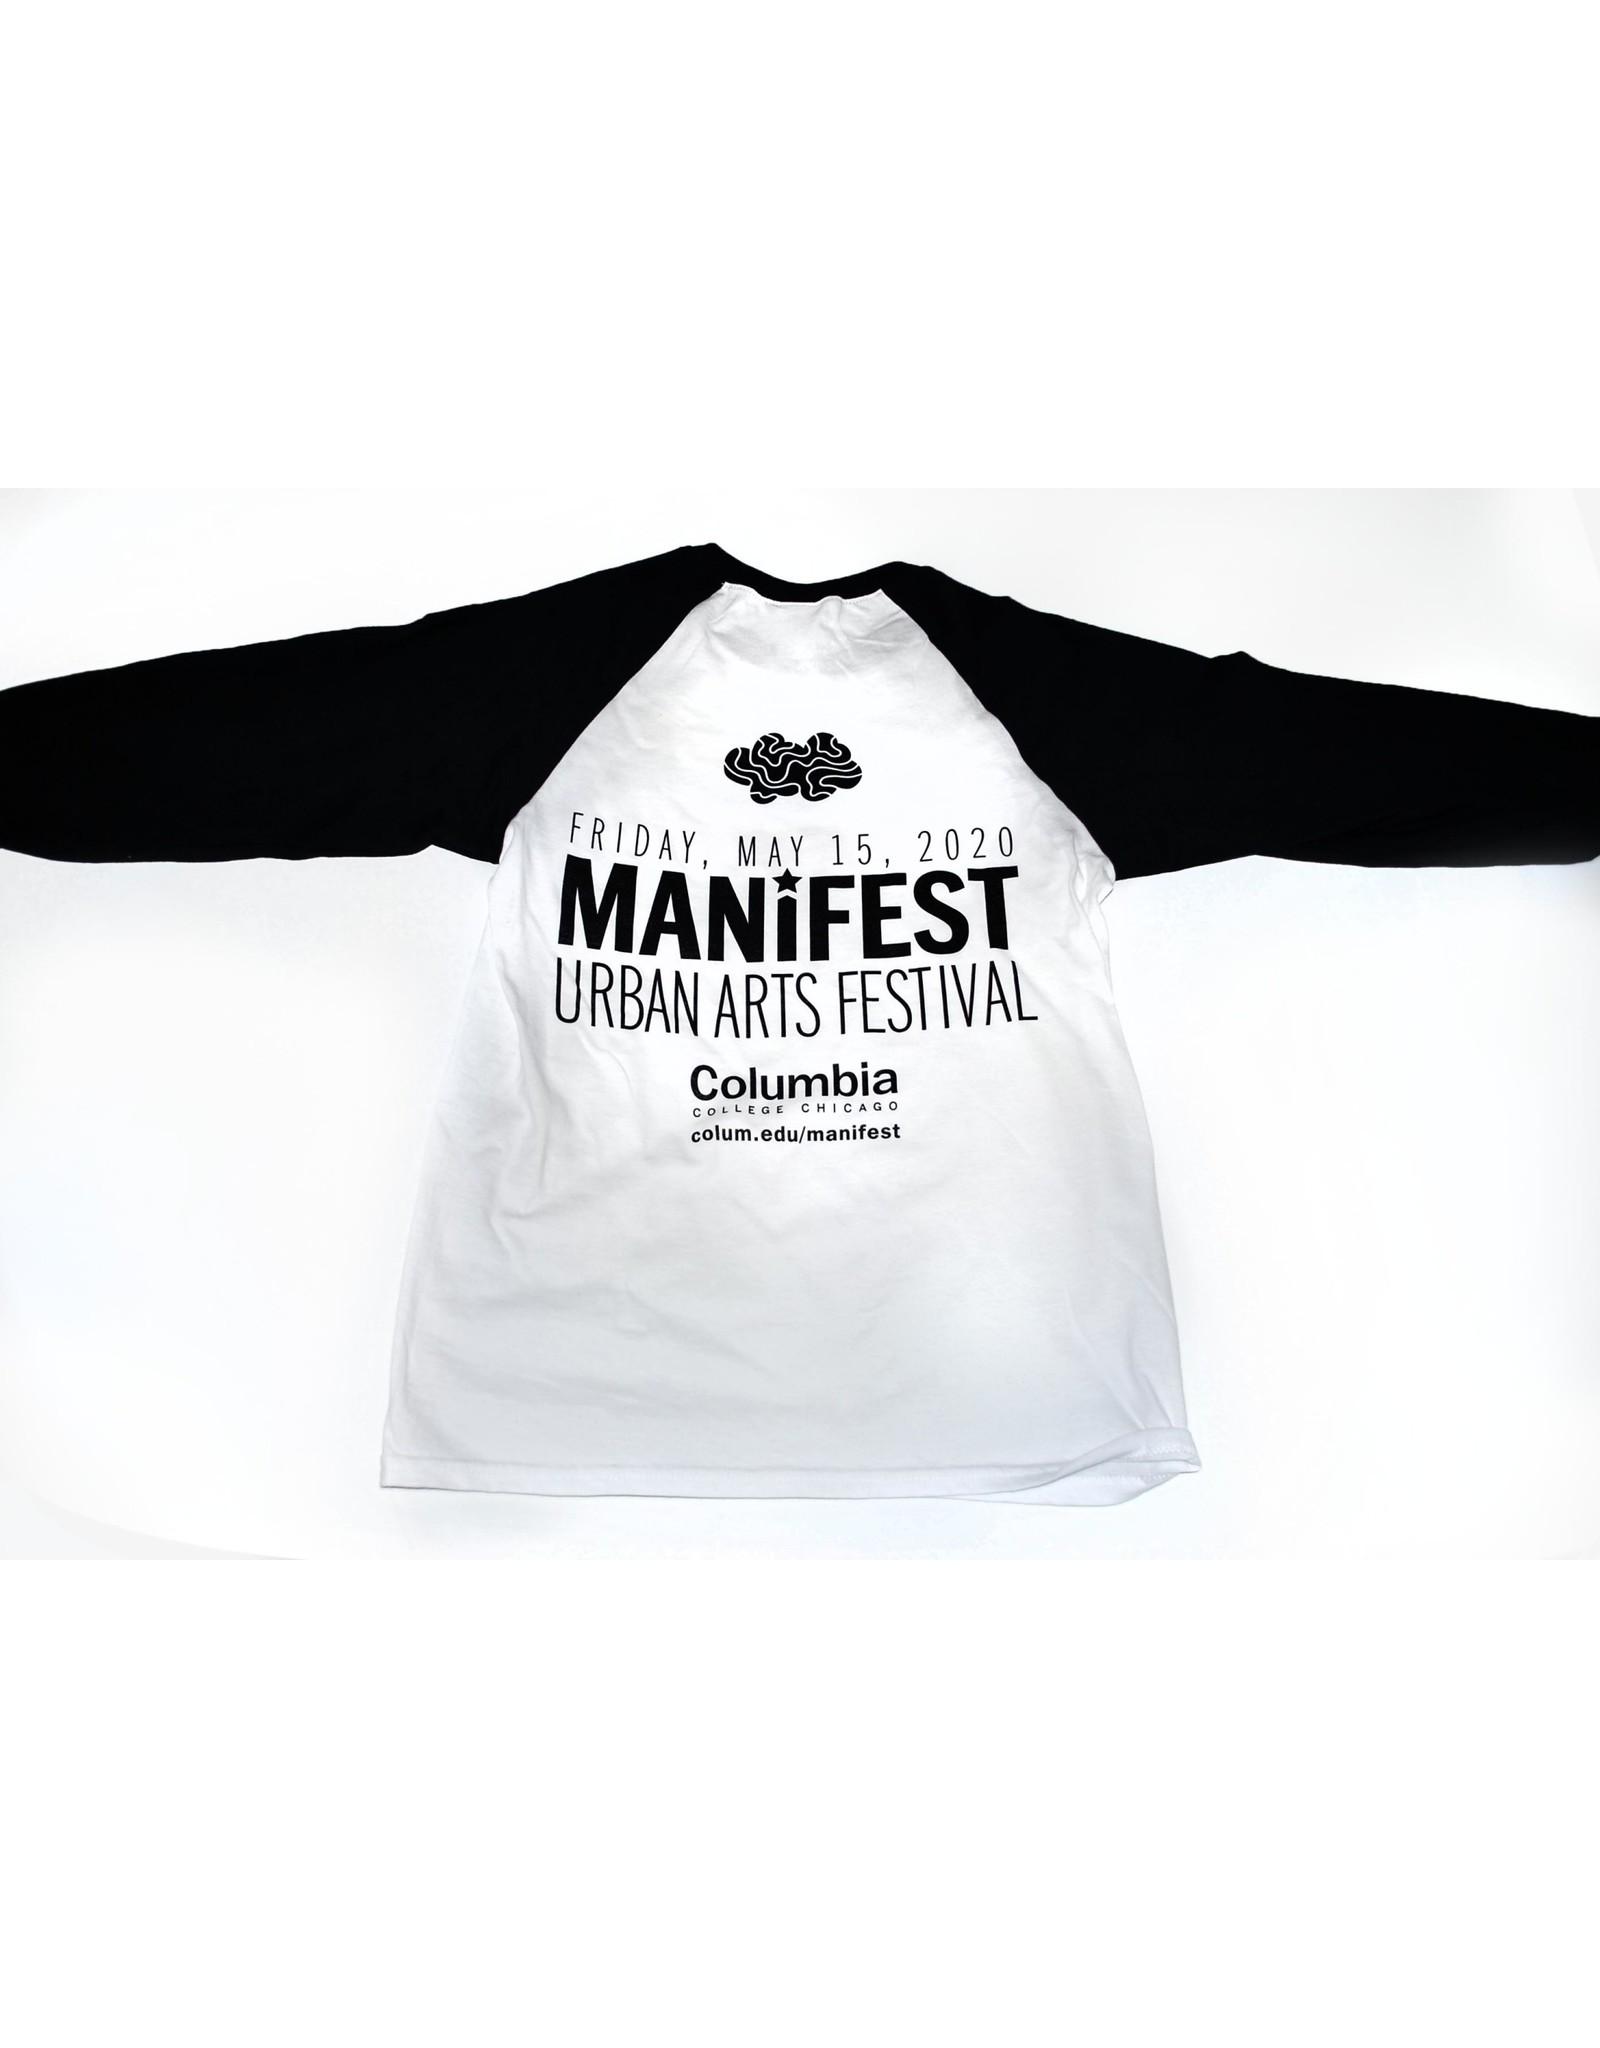 Manifest 2020 baseball tee XS ONLY!